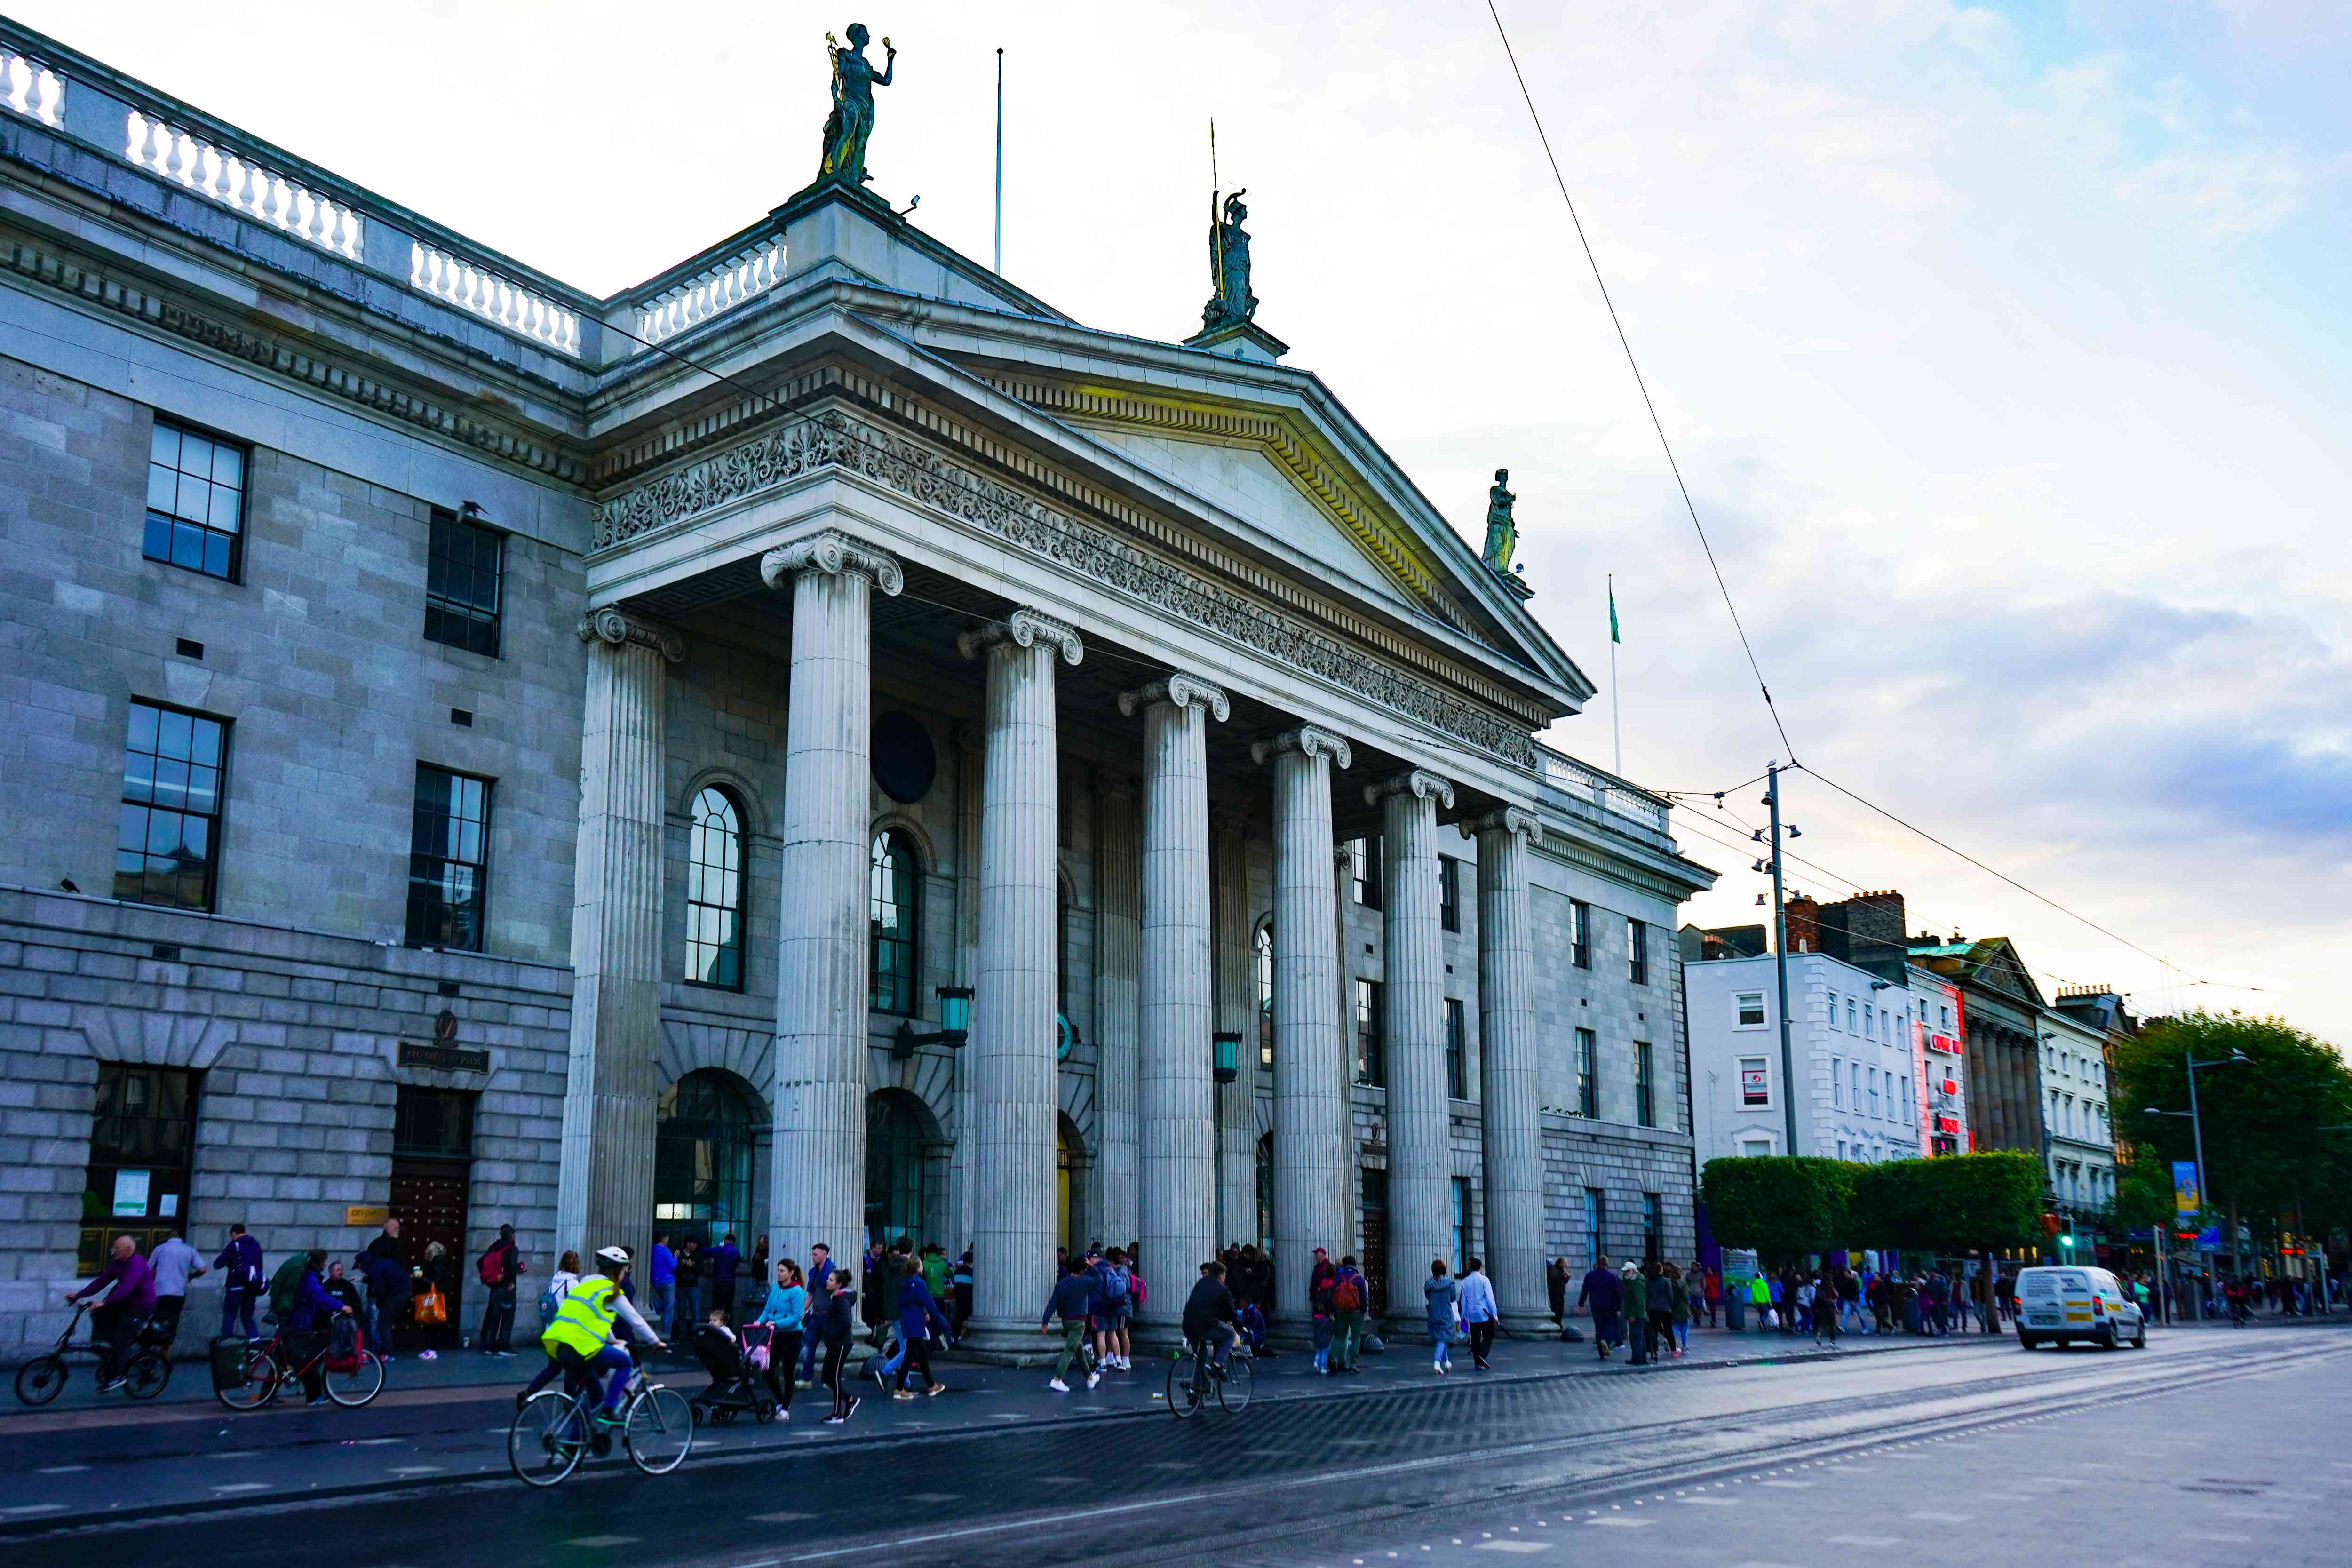 General Post Office in Dublin, Ireland